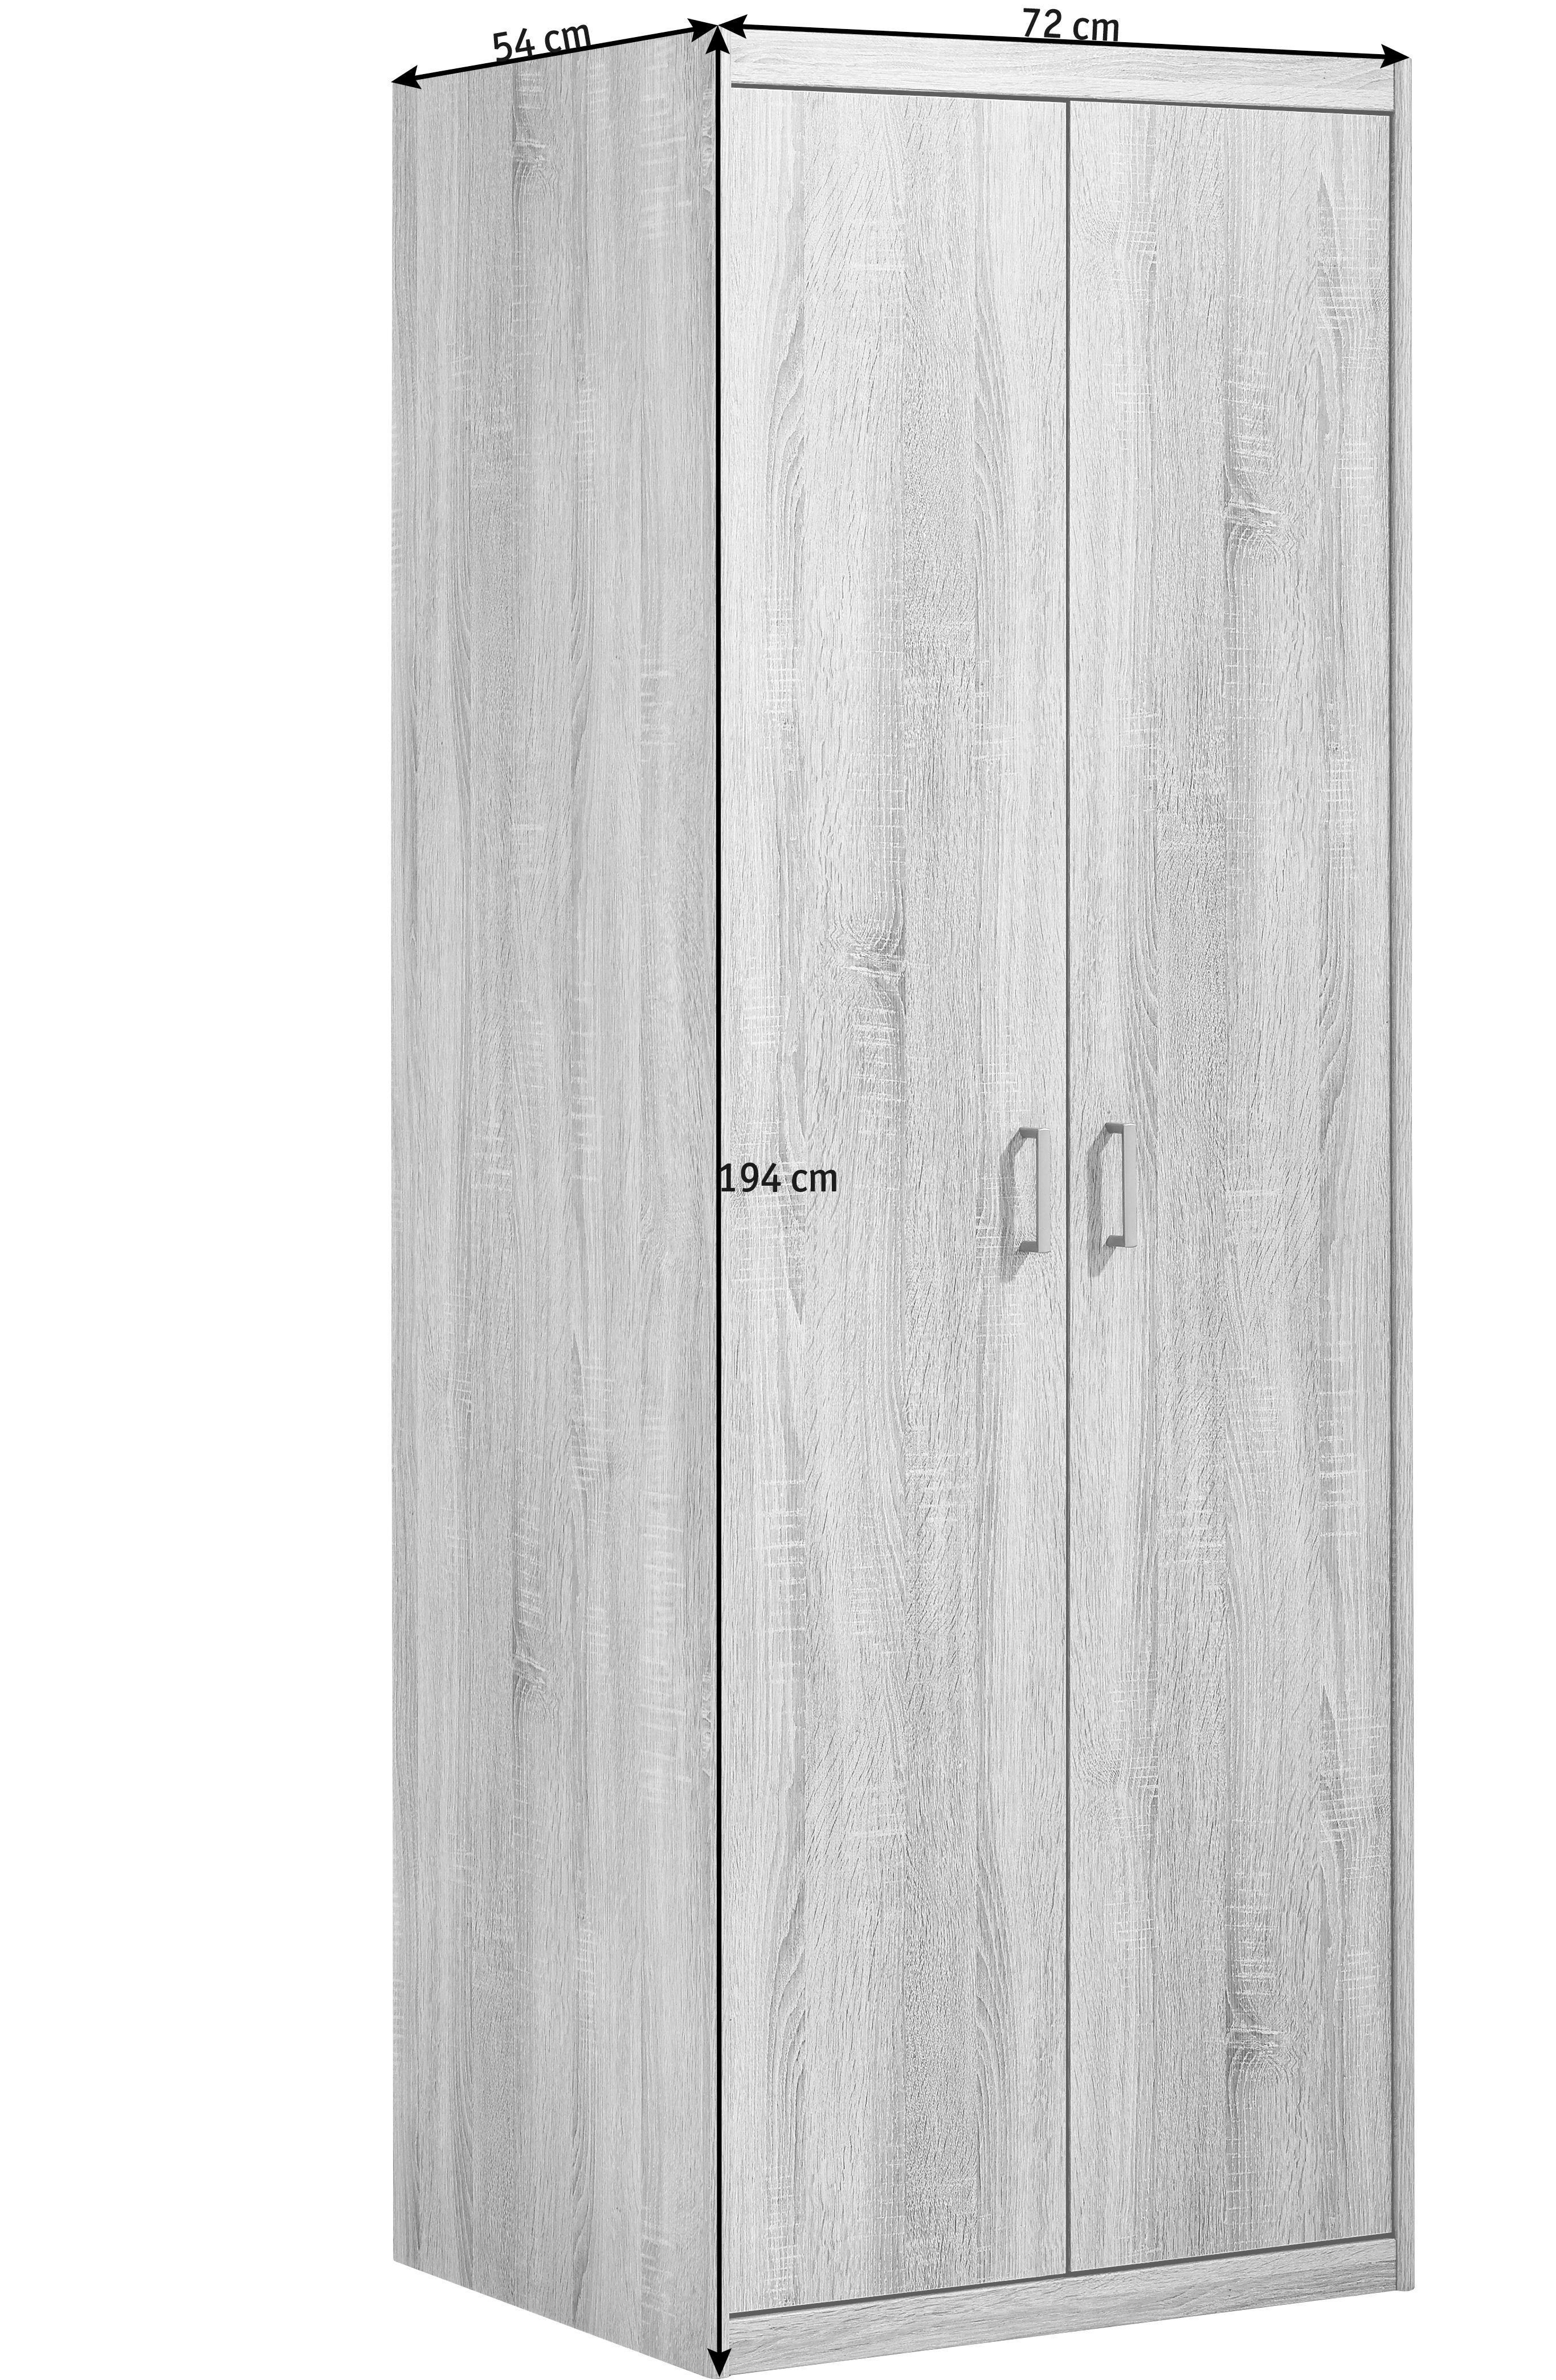 ORMAR ZA ODJEĆU - boje hrasta/boje srebra, Konvencionalno, drvni materijal/plastika (72/194/54cm) - CS SCHMAL